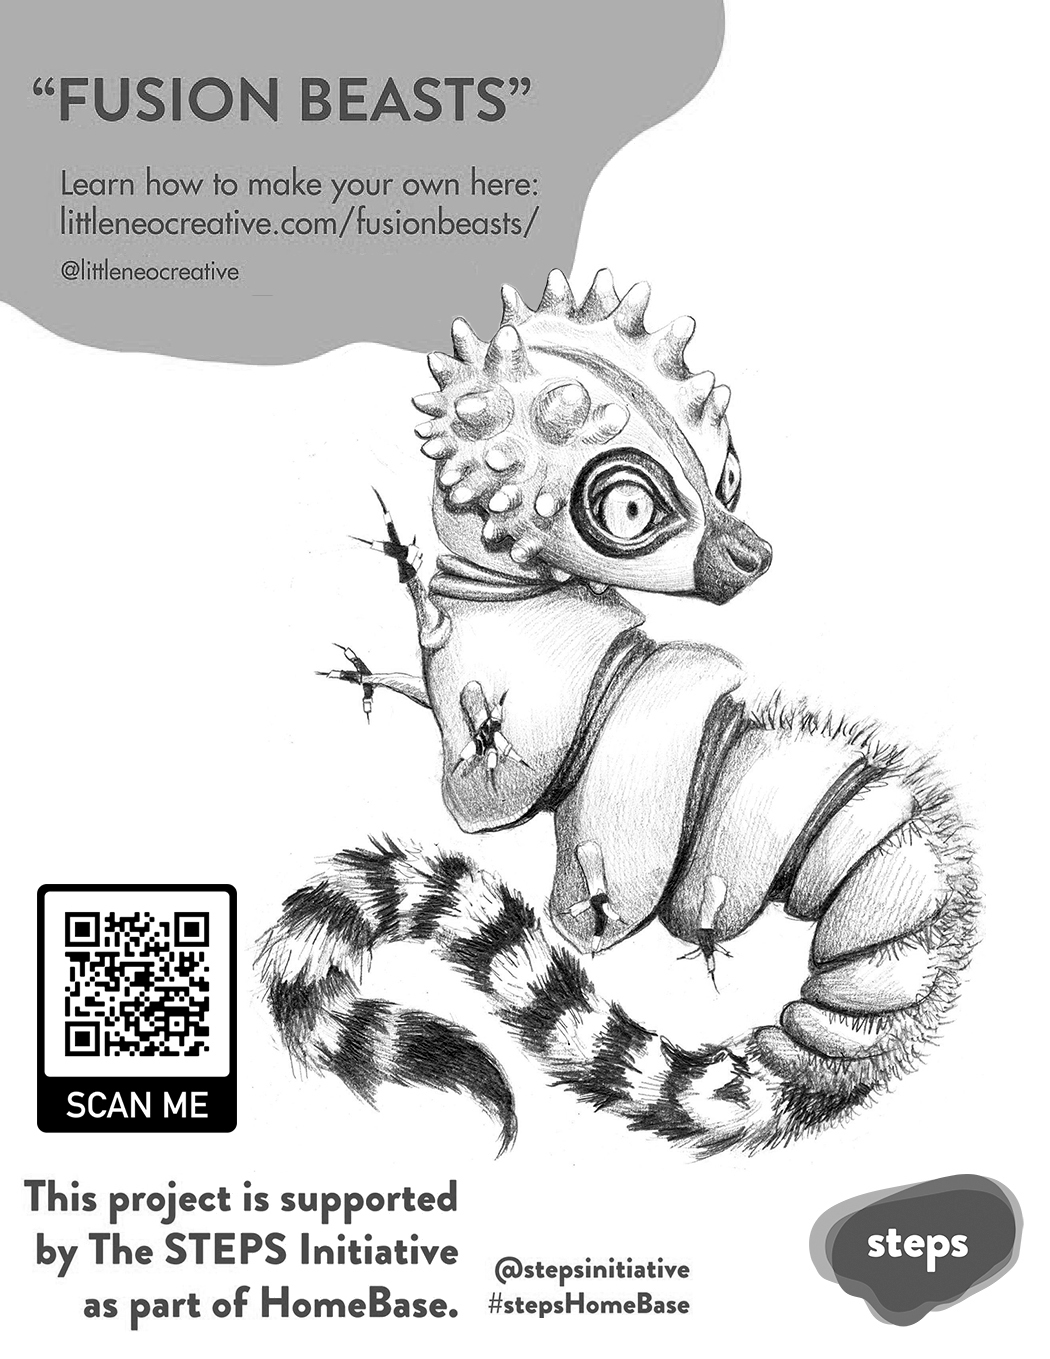 Fusion Beast Poster, April 2020